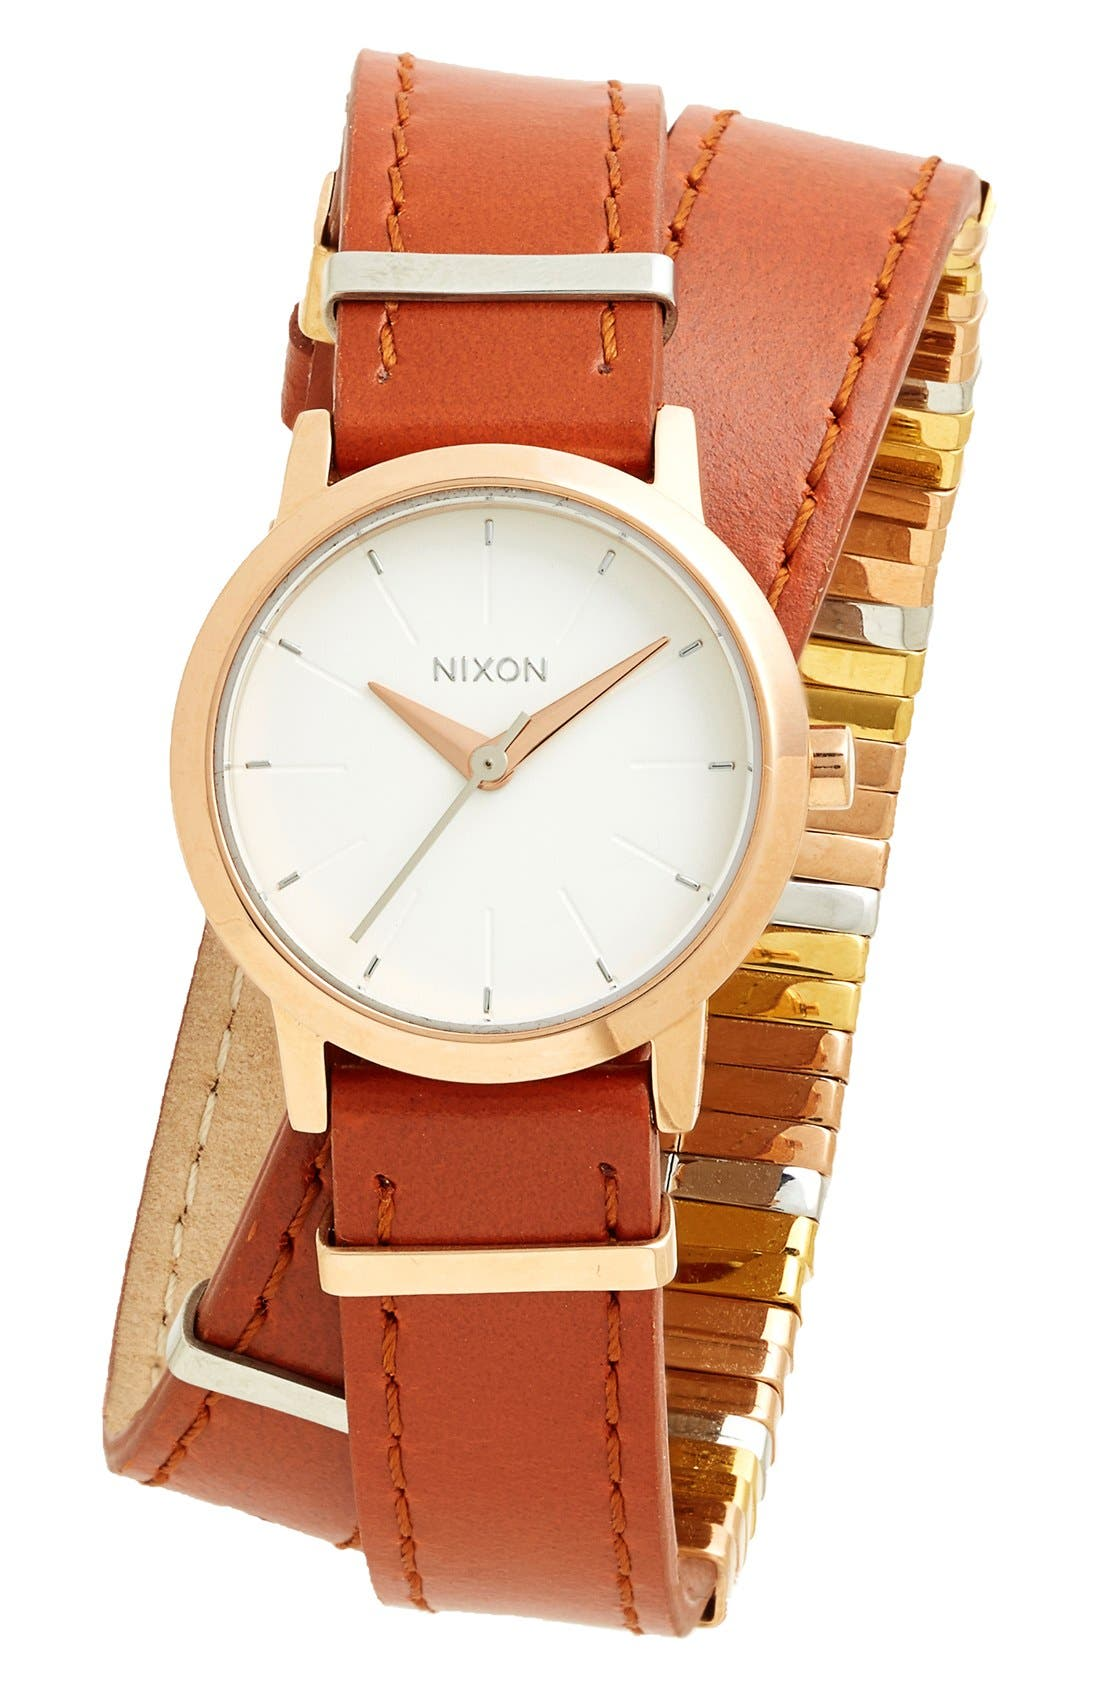 Main Image - Nixon 'The Kenzi' Metal Detail Wrap Leather Strap Watch, 26mm